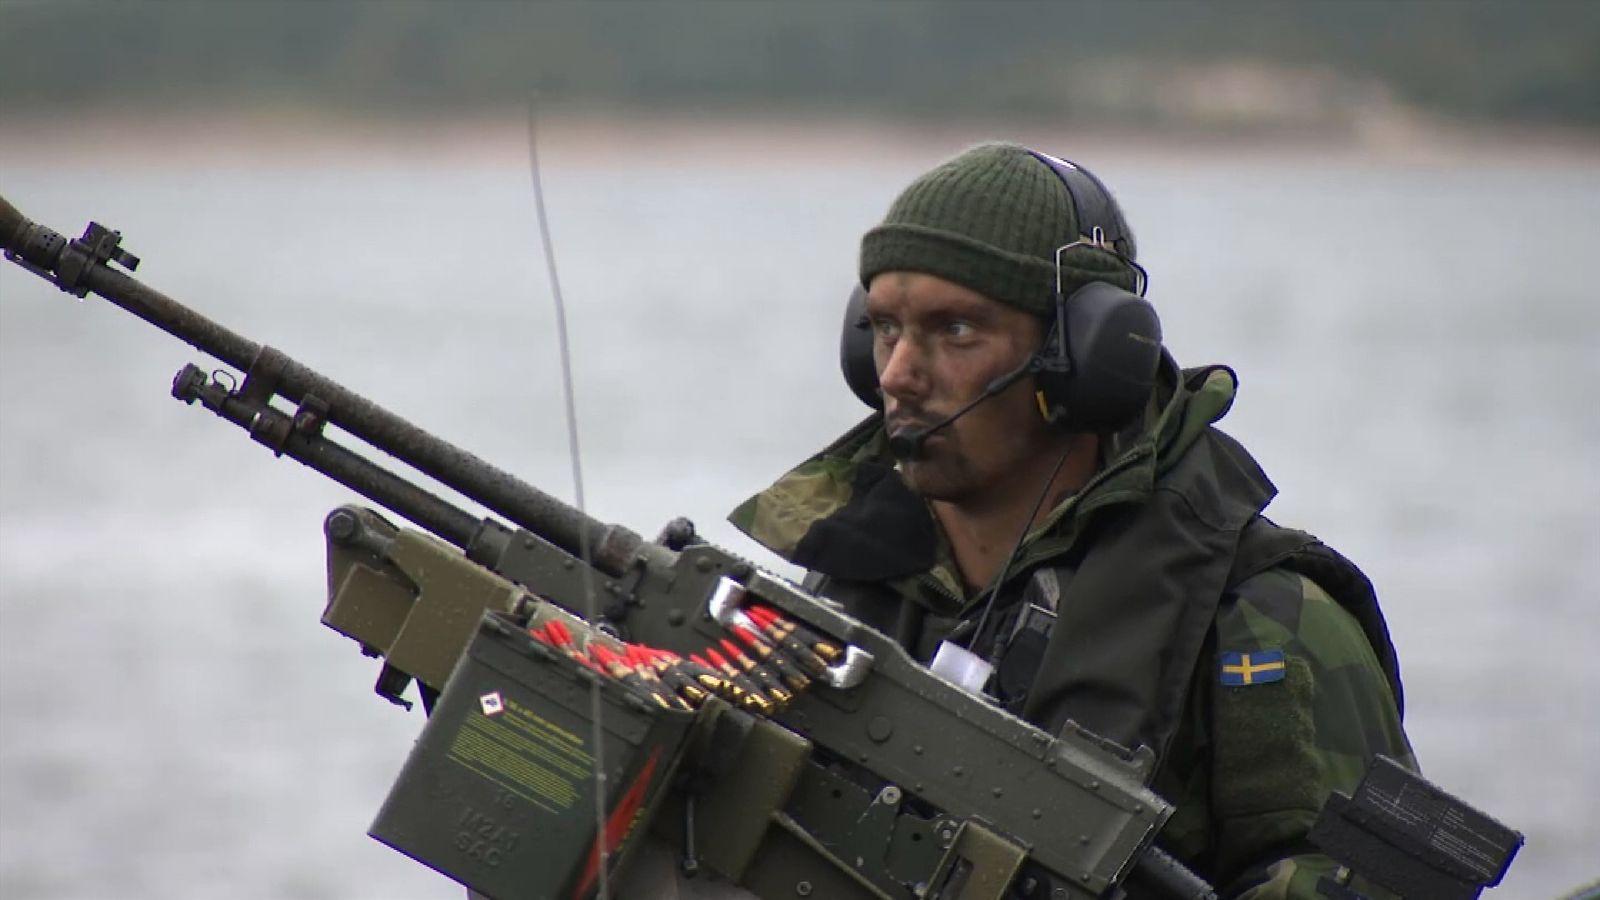 Aurora 17: Nervous Sweden stages huge military exercise